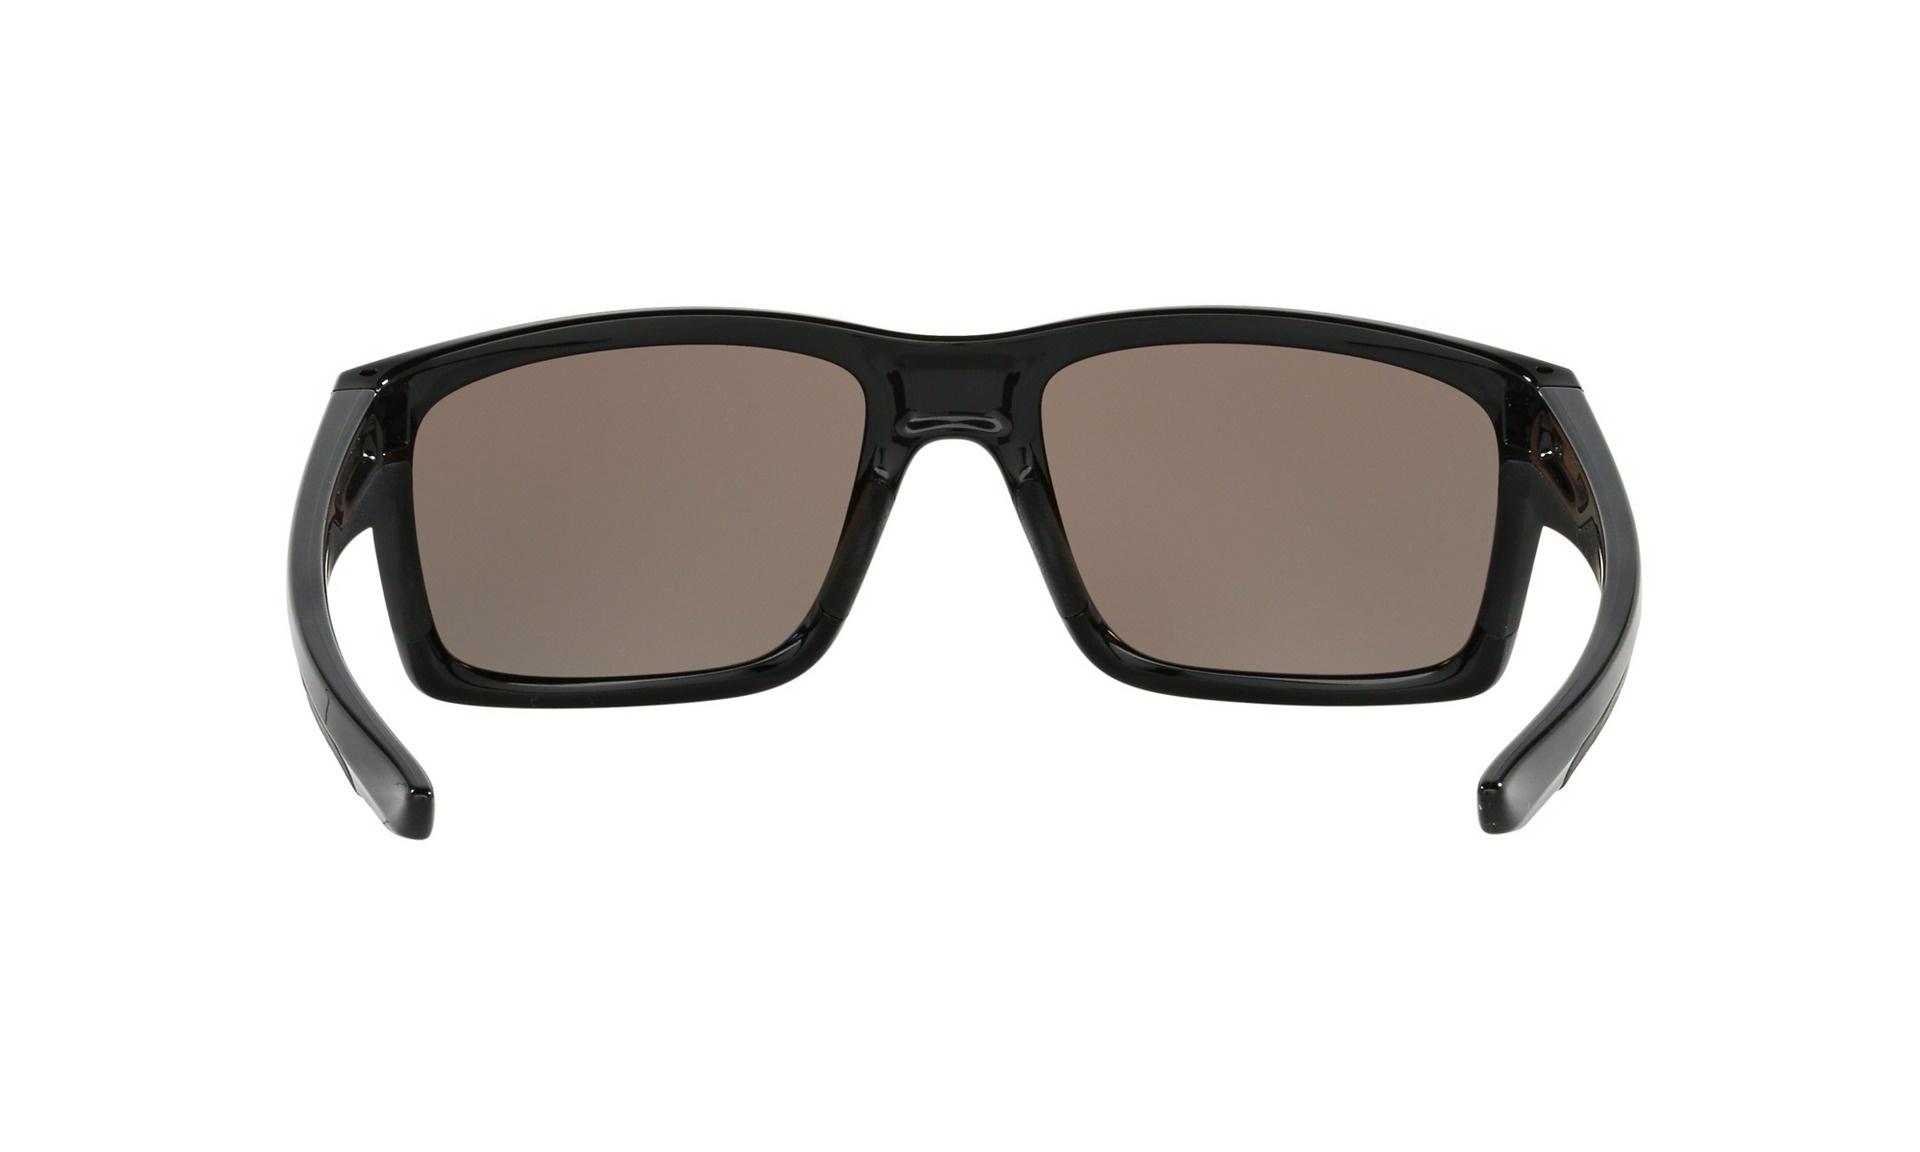 cdcf52b27e Oakley Mainlink - Polished Black w Prizm Daily Polarized - Out There ...